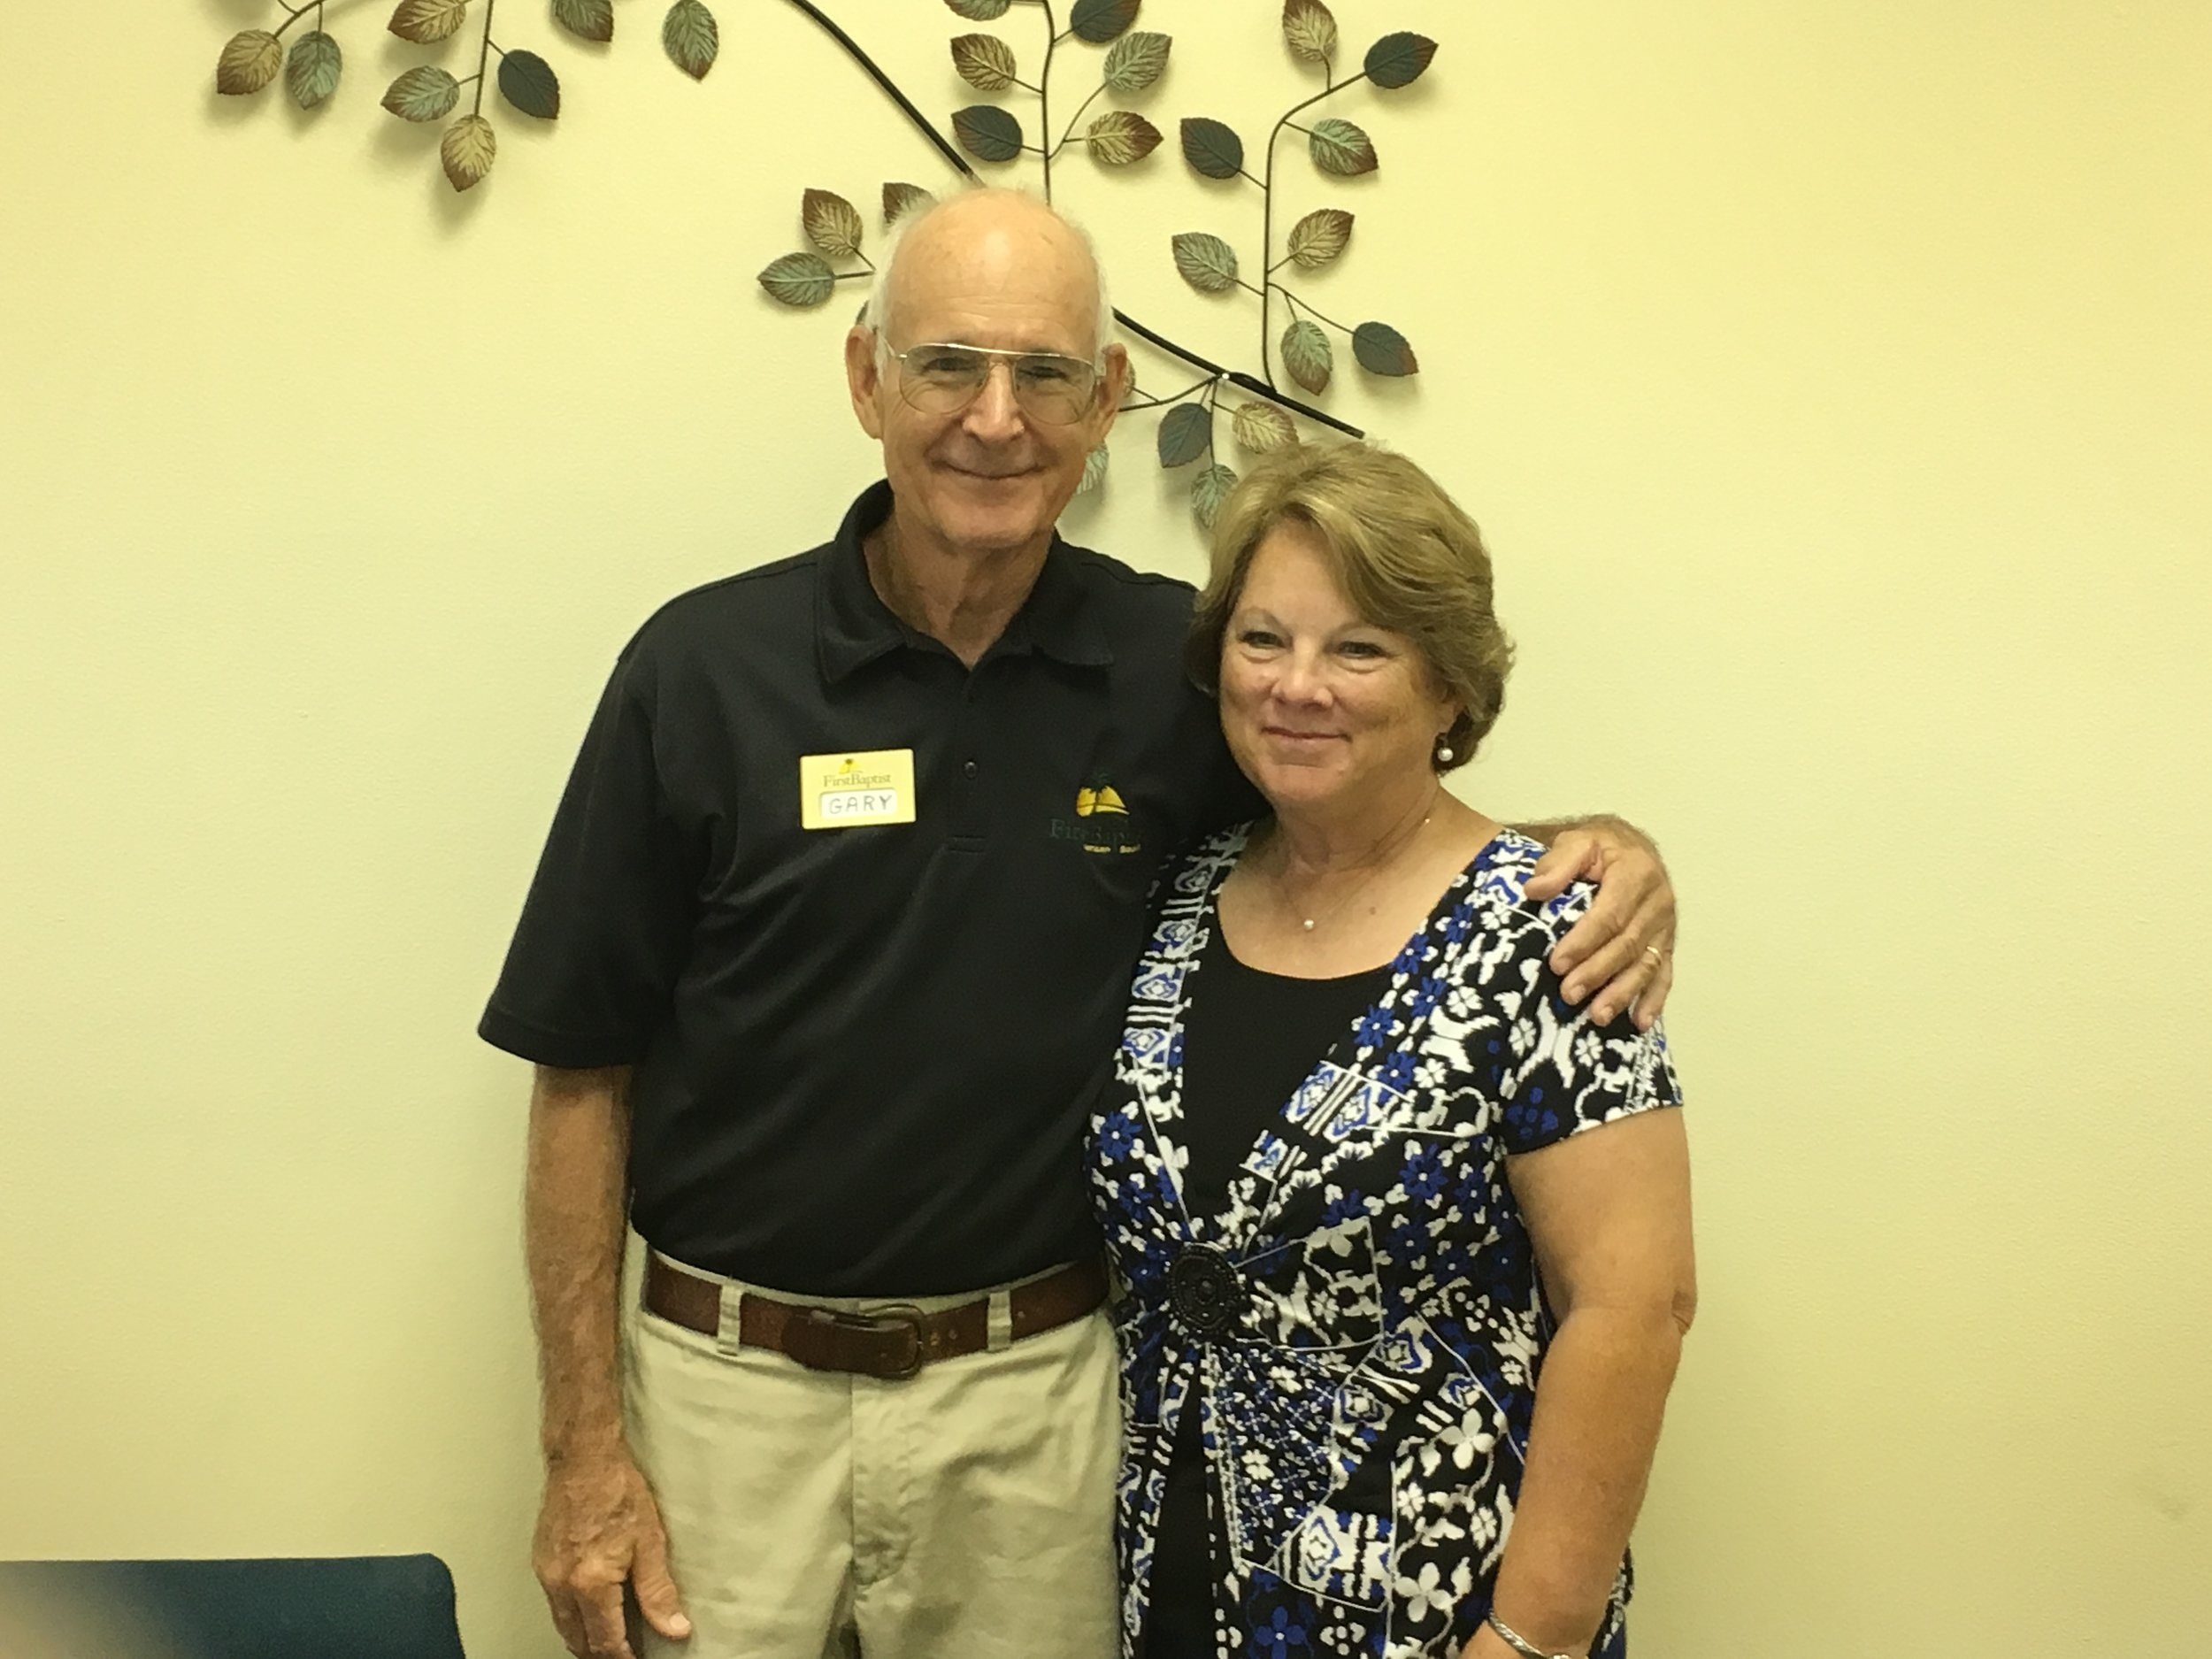 Gary and Kathryn Wintercorn